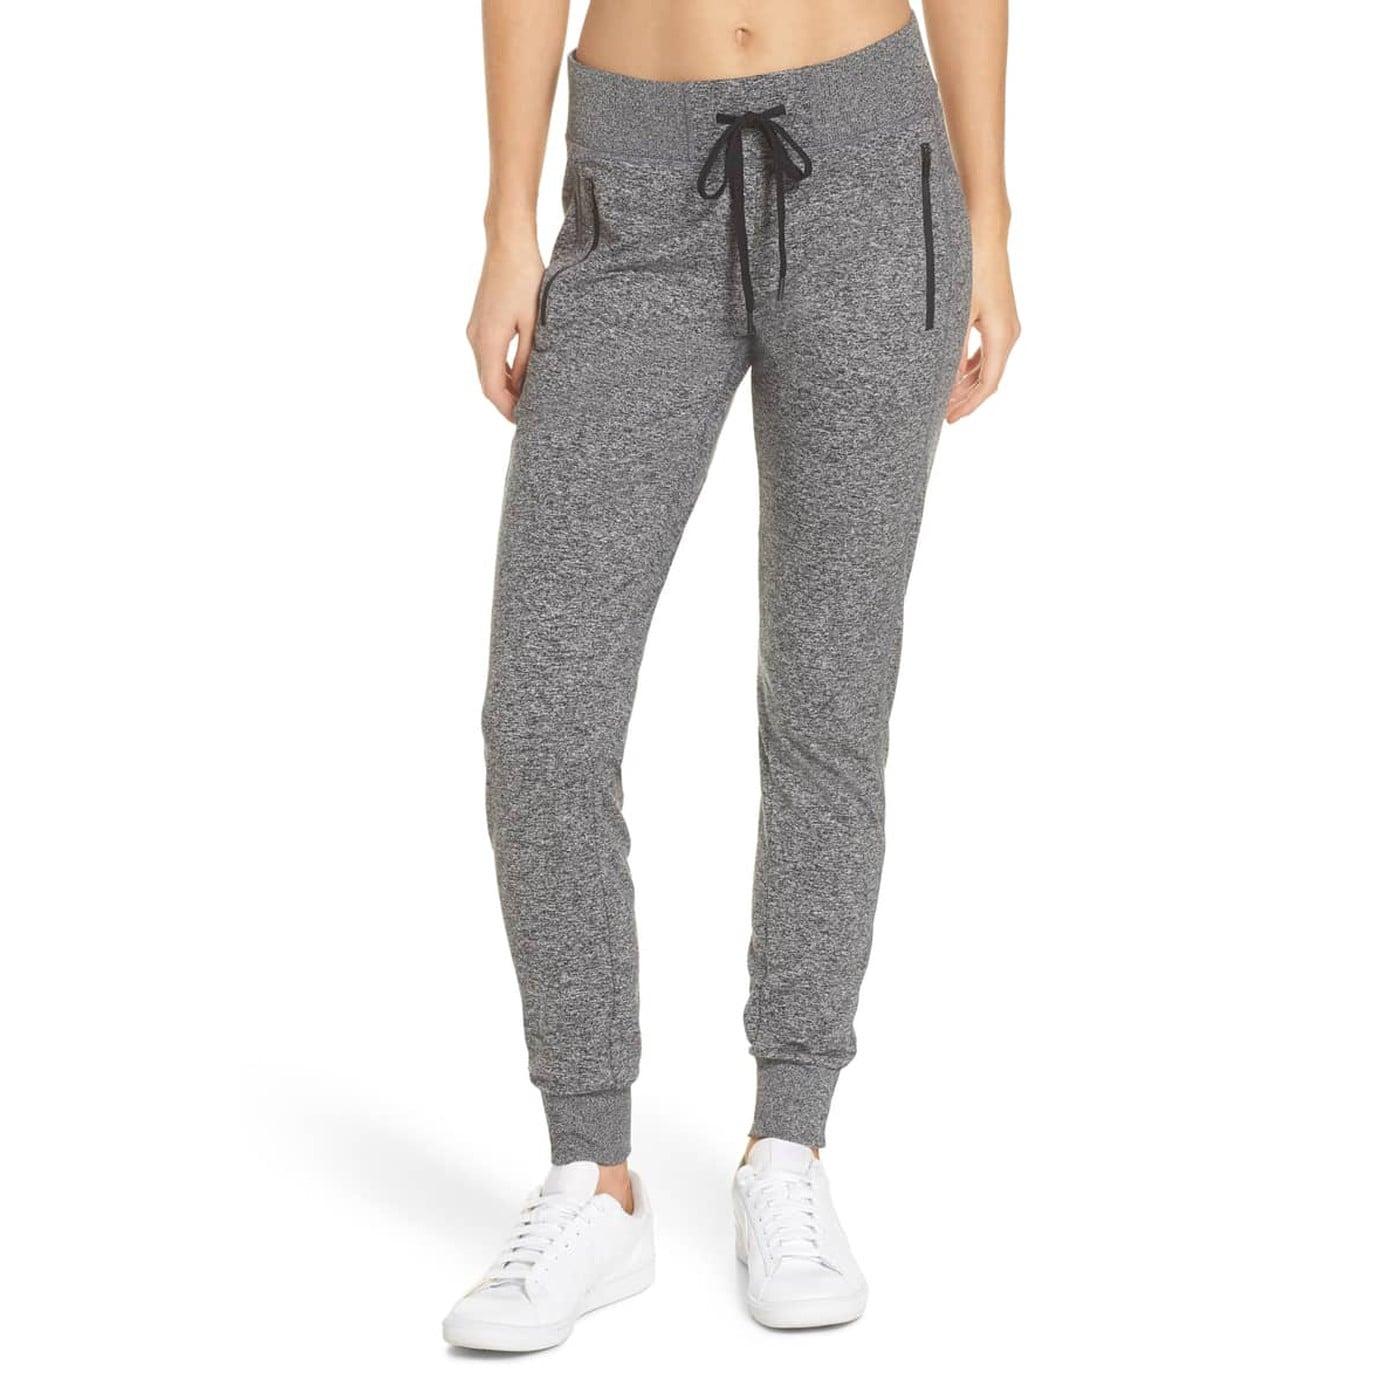 eb46ff4f Nike Sportswear Rally Jogger Pants | Cozy Sweatpants 2018 | POPSUGAR  Fitness Photo 6